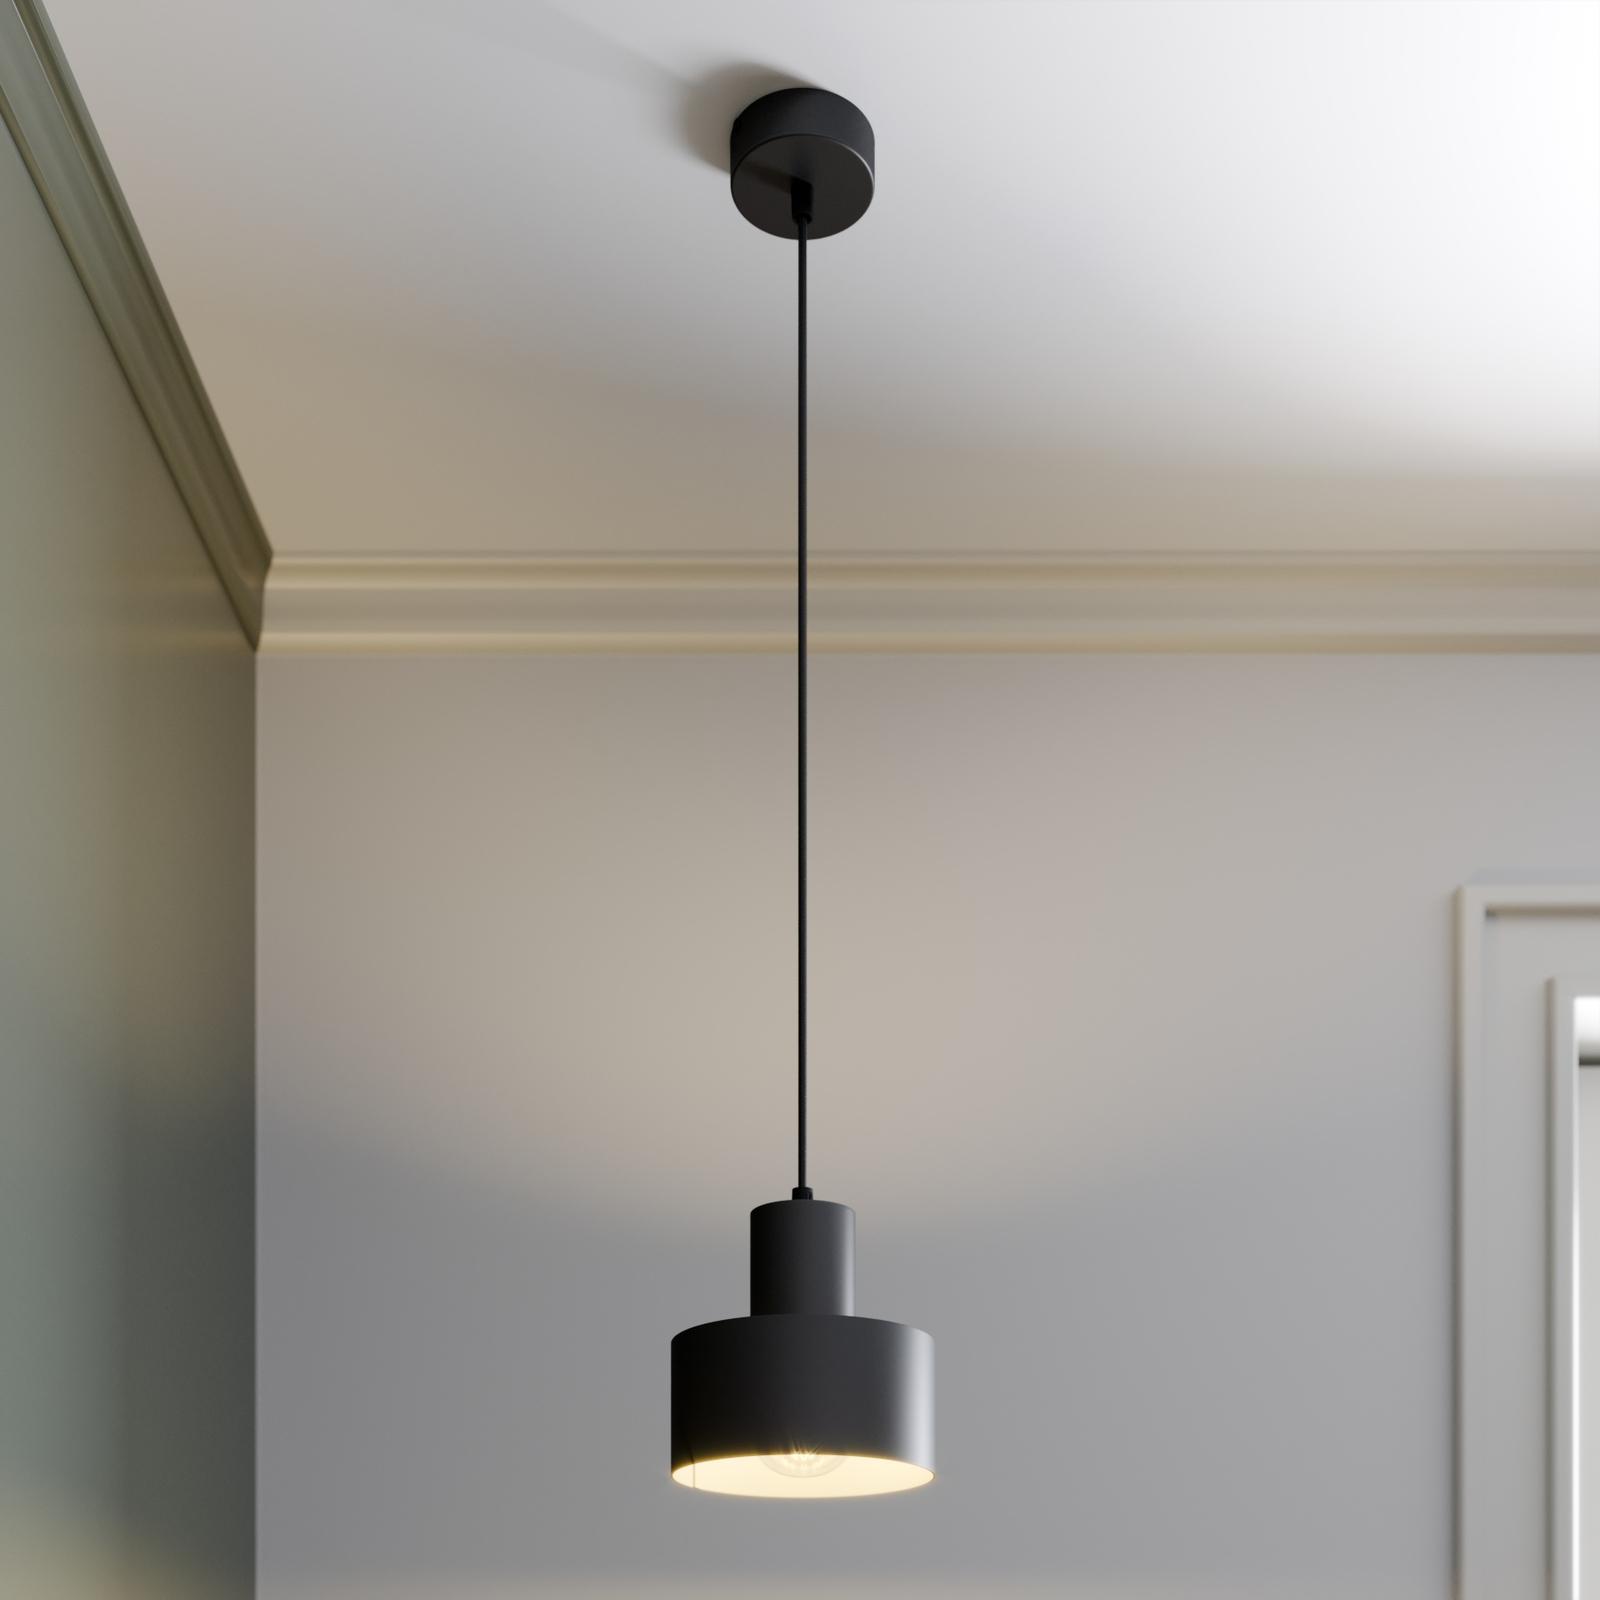 Rif hængelampe, metal, sort, Ø 15 cm